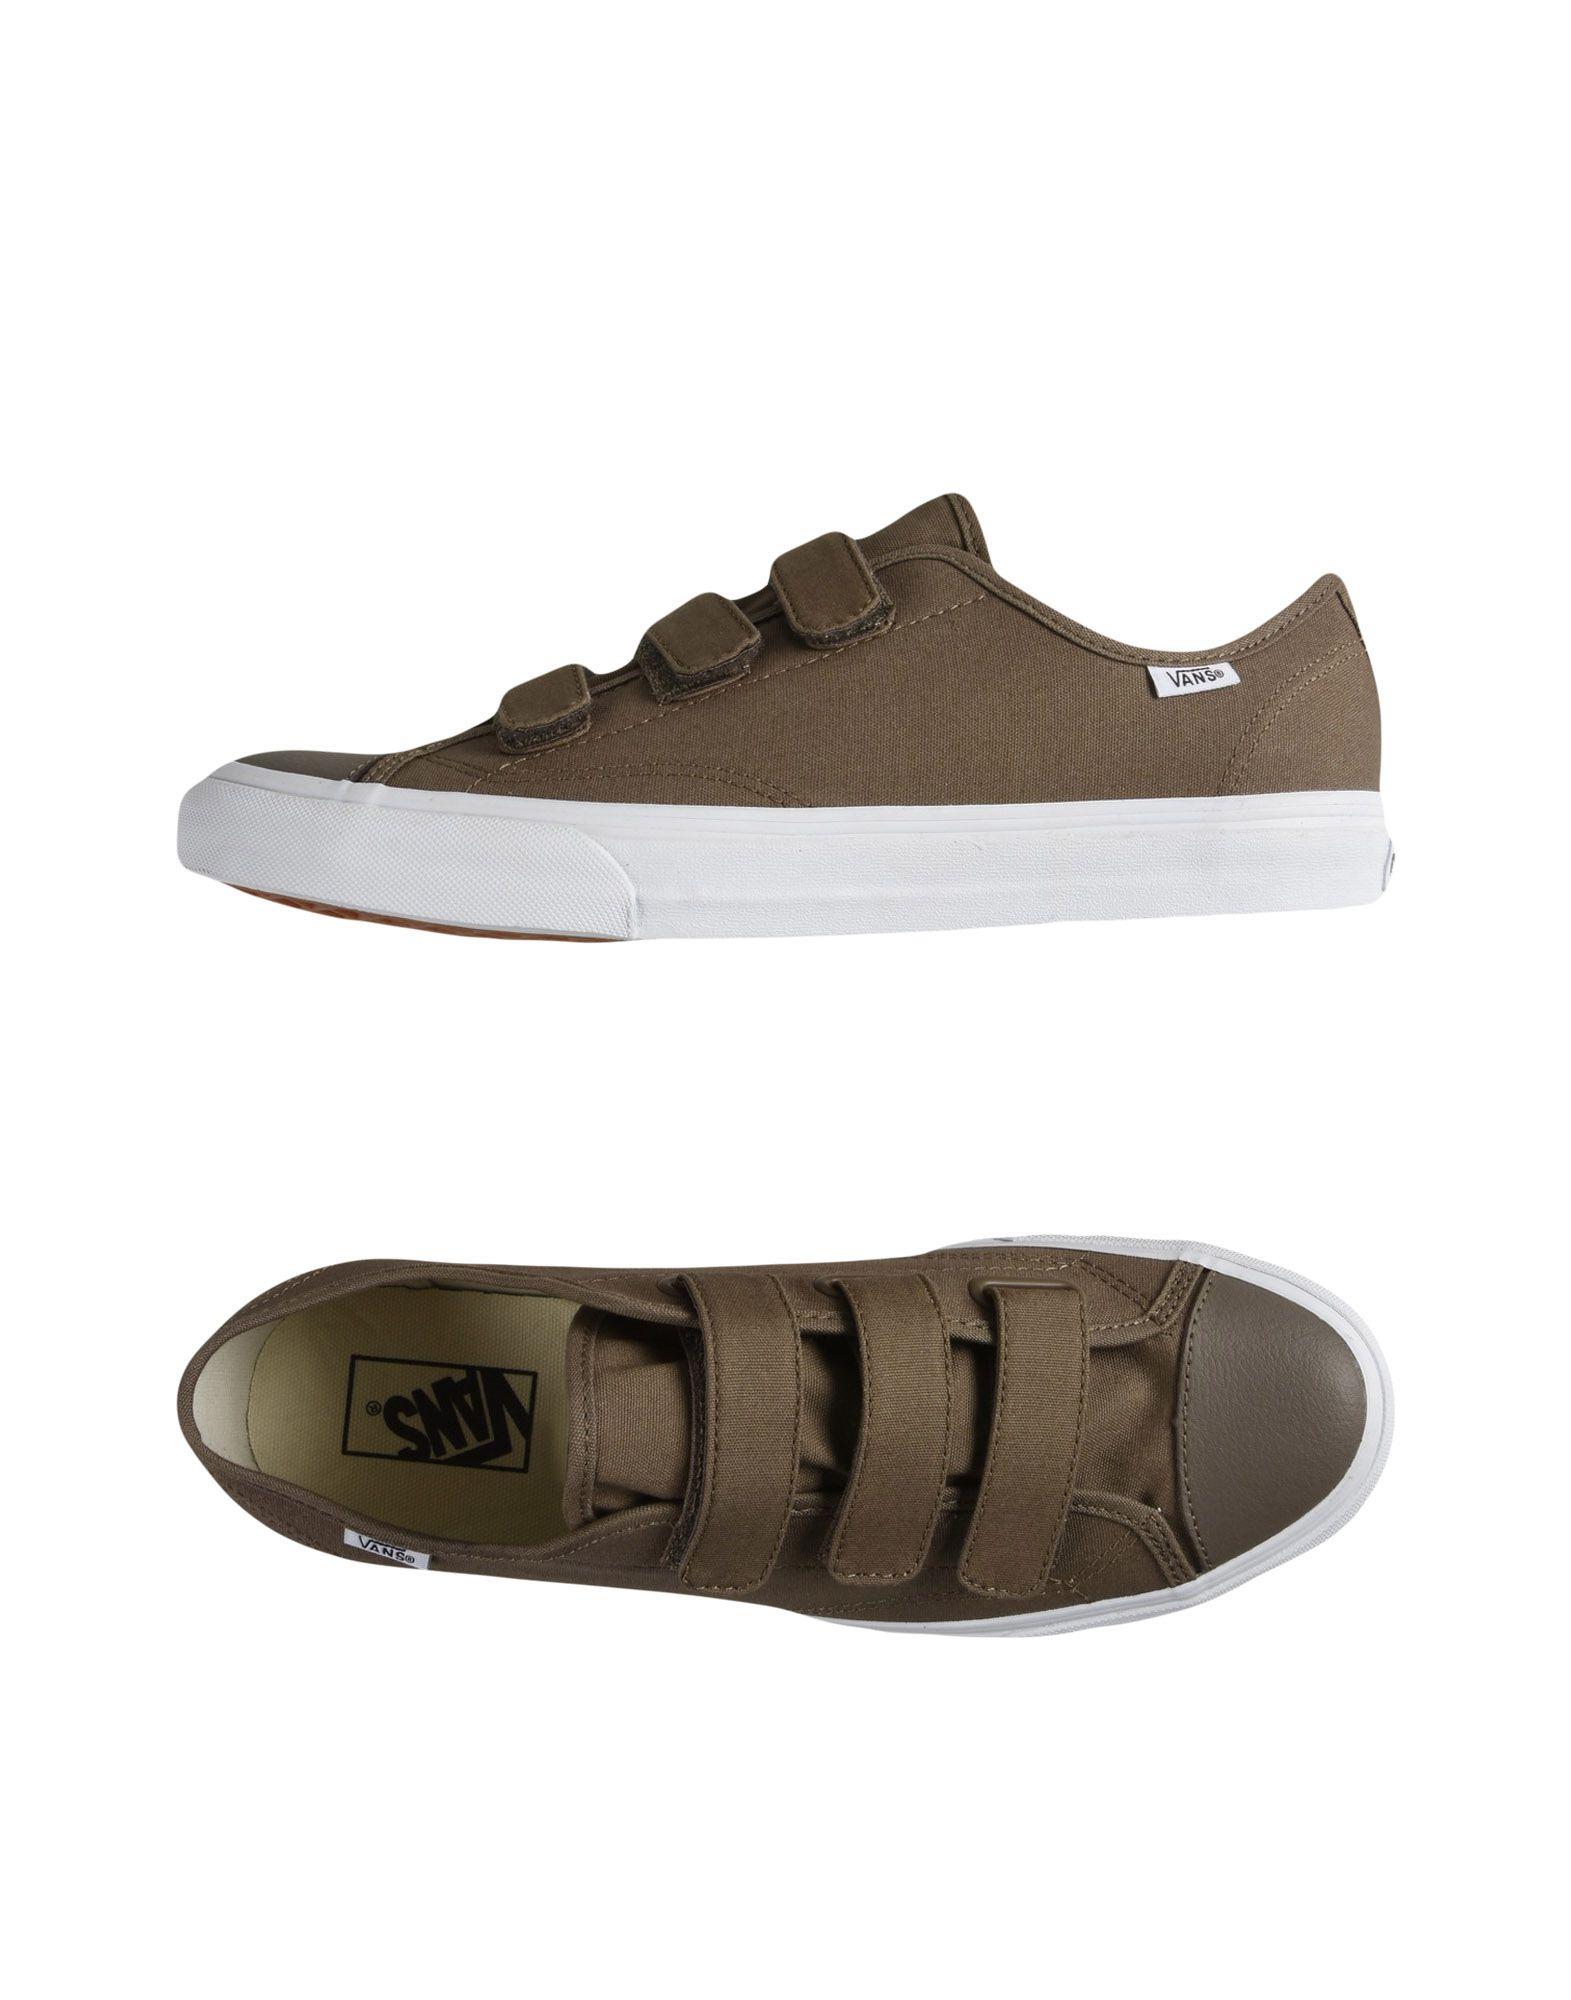 Sneakers Vans Ua Prison Issue - Canvas - Uomo - 11231926QV